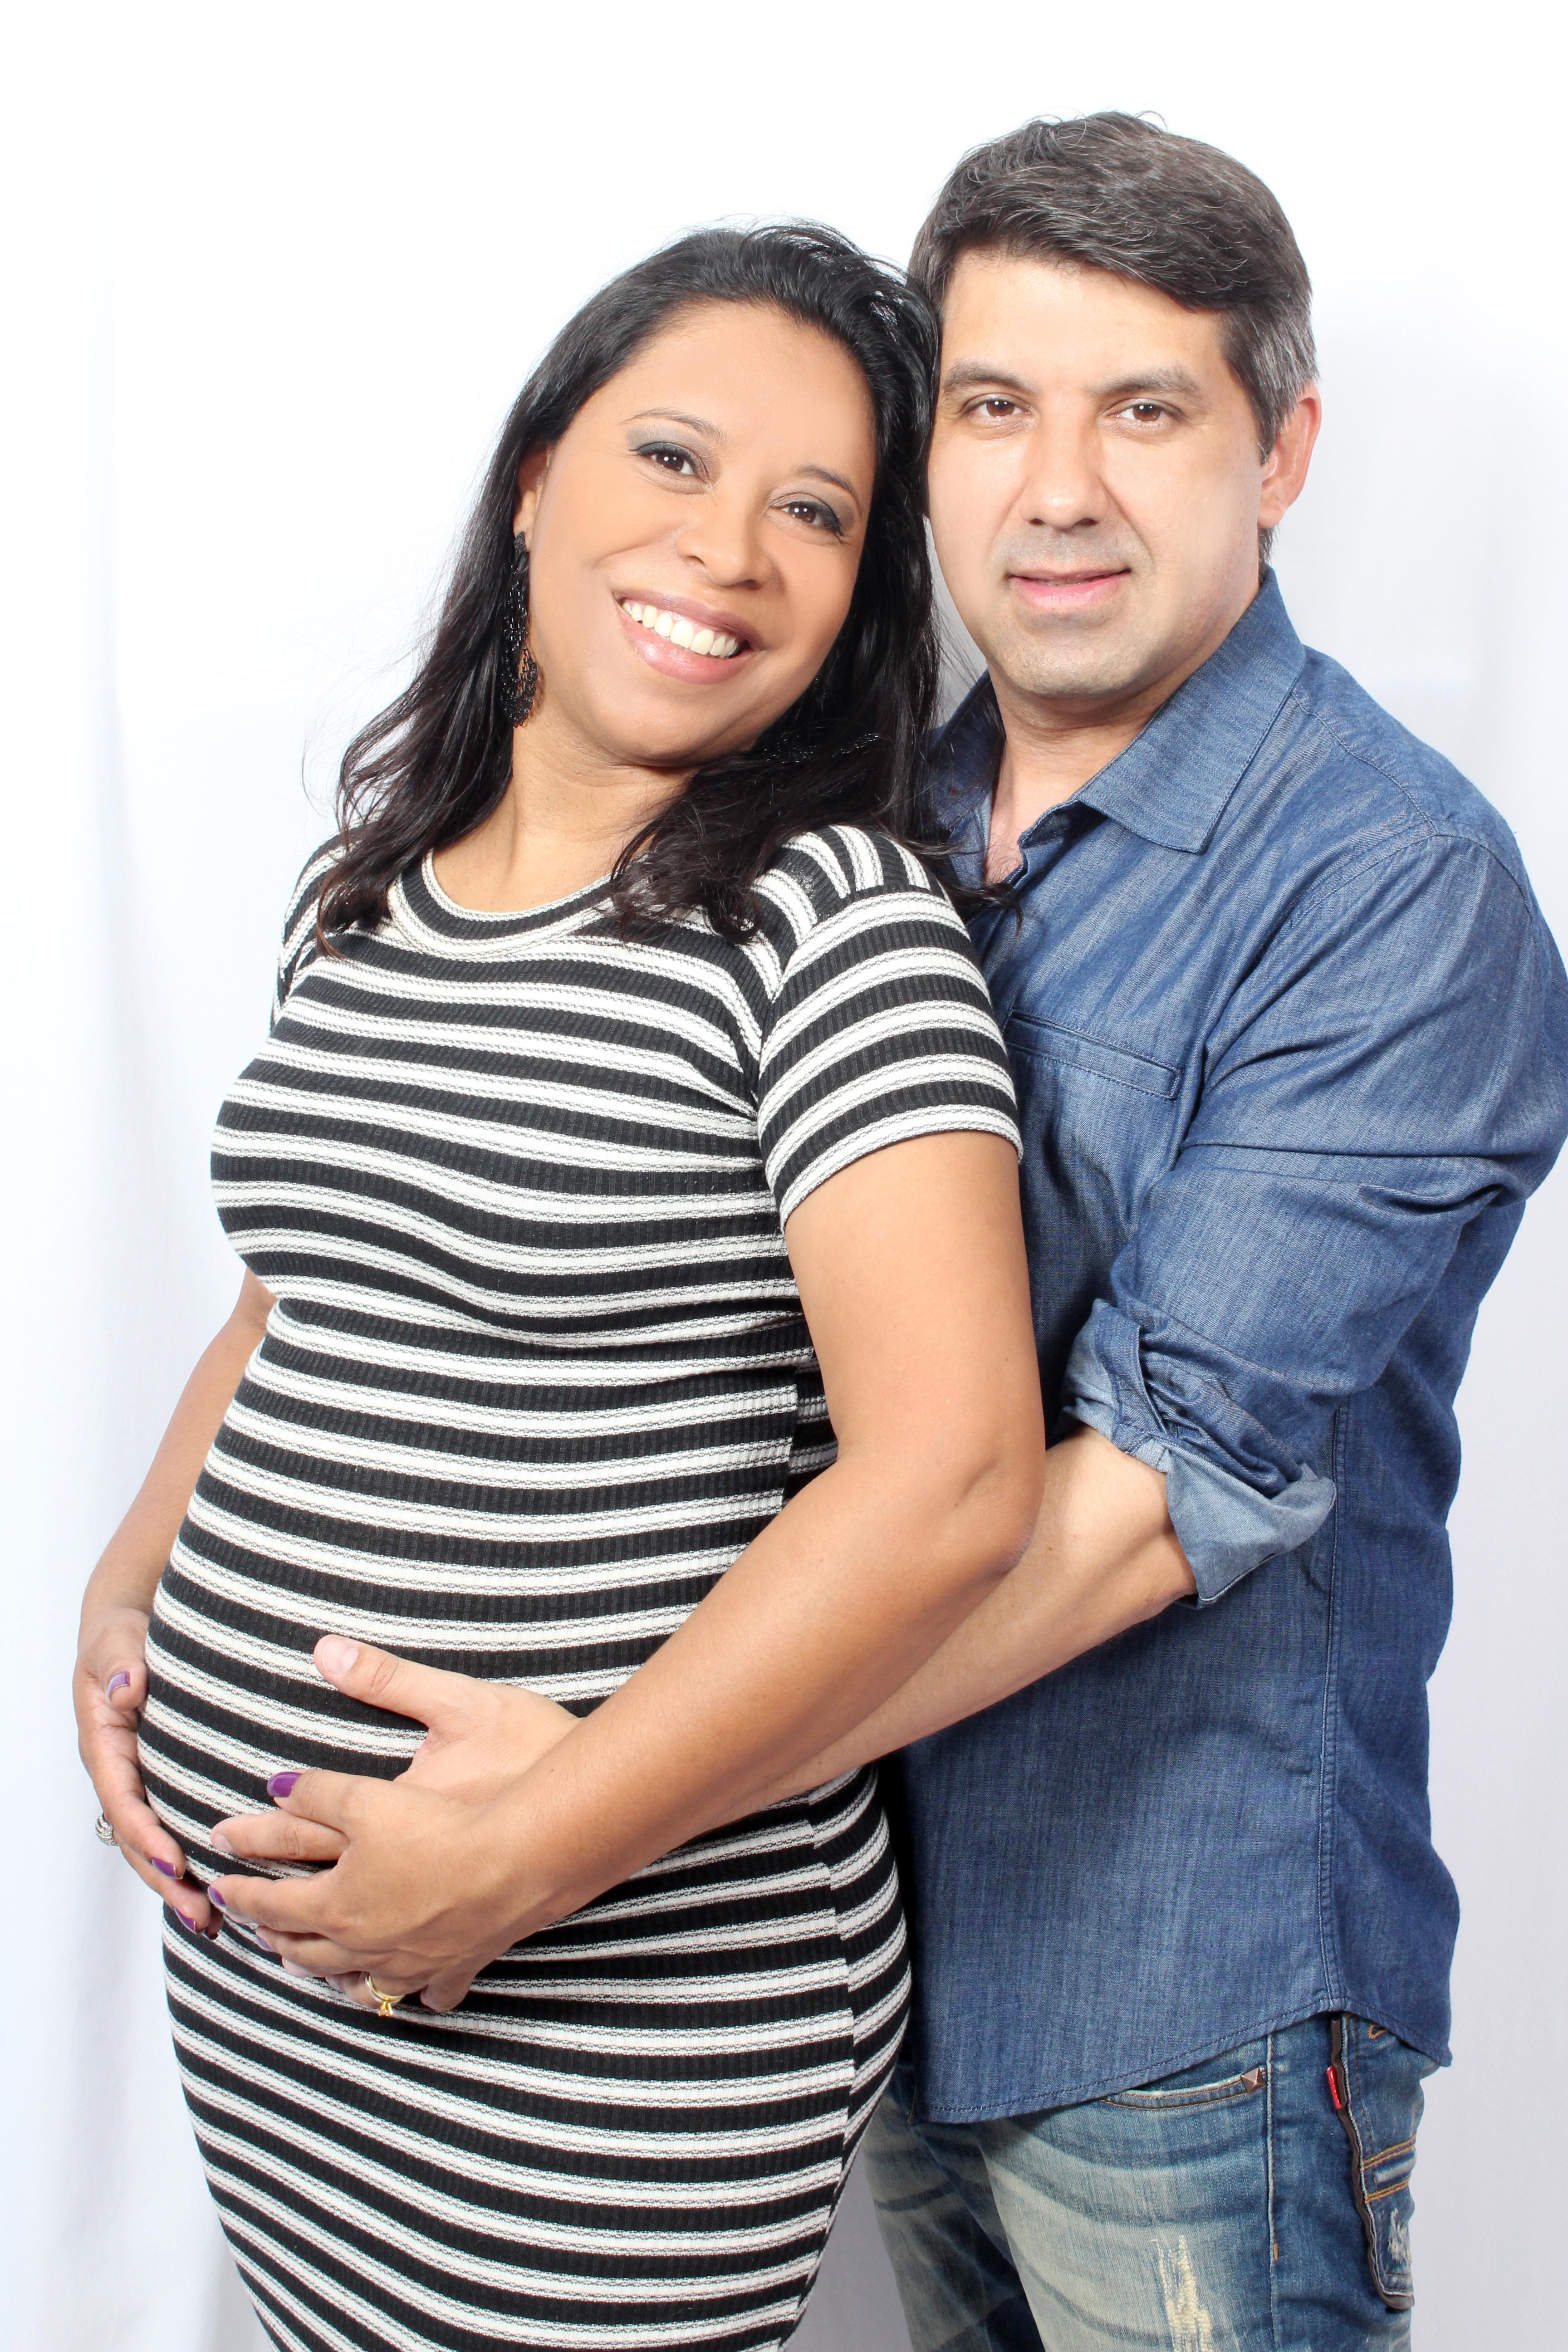 Mãe Depois Dos 40 | Como Engravidei Aos 42 Anos Post